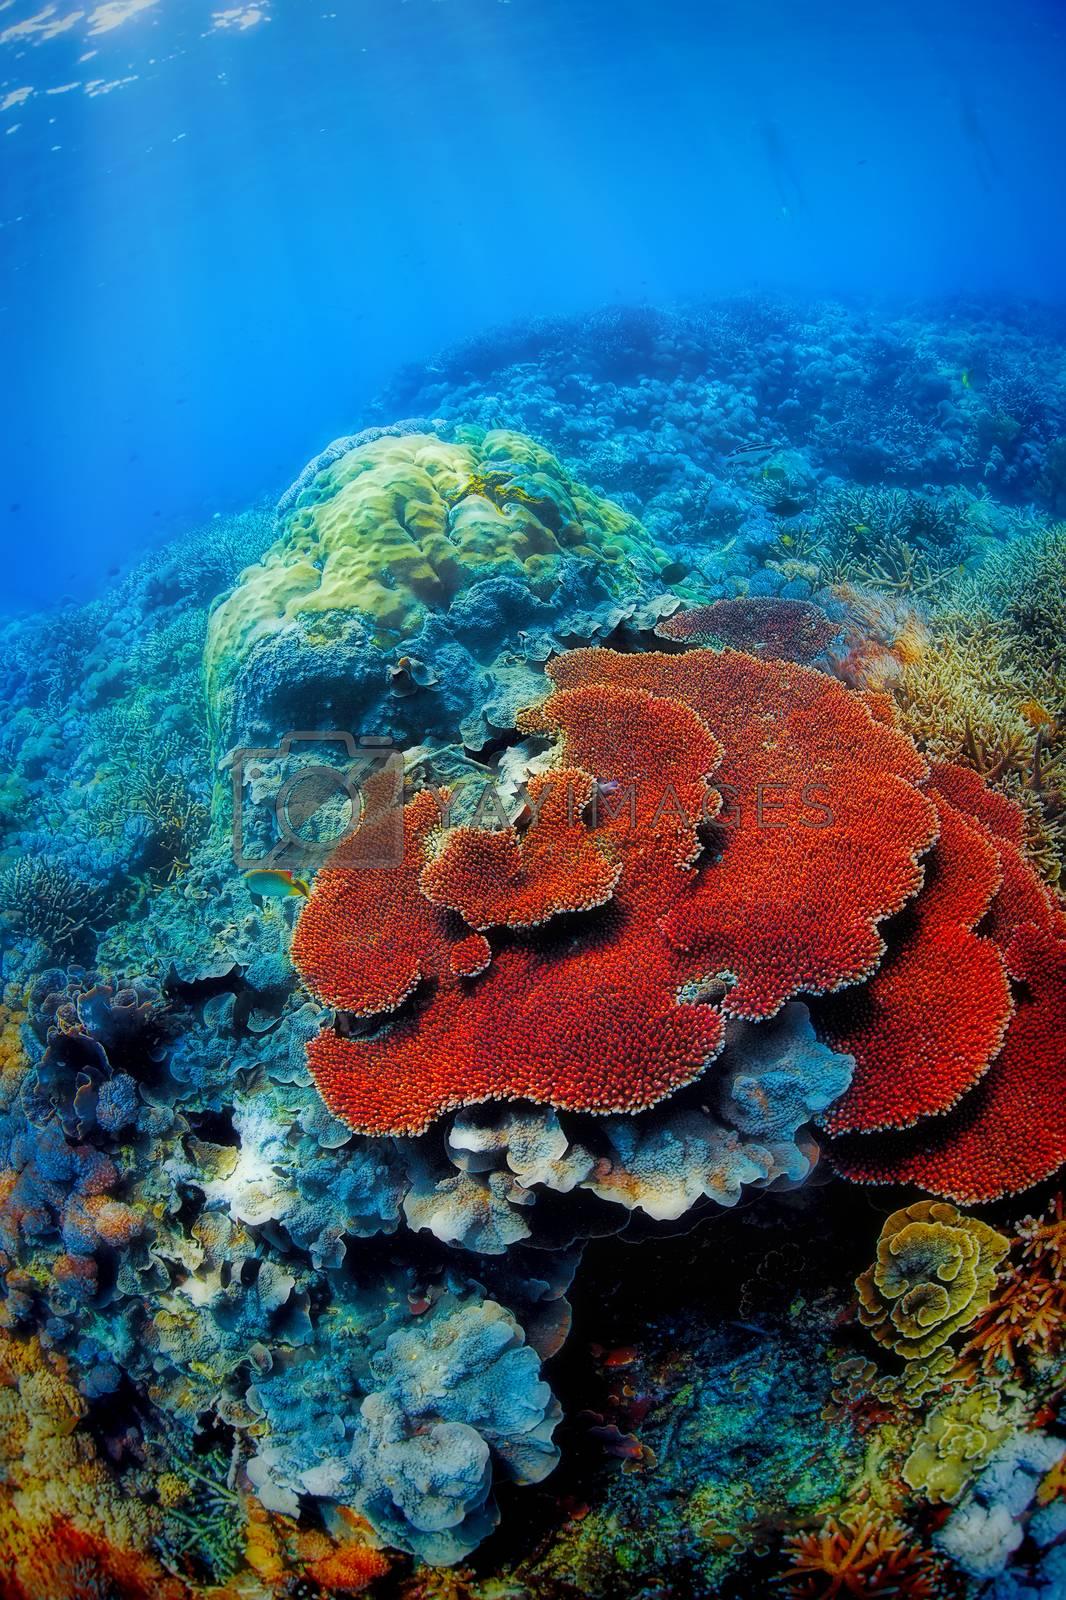 Royalty free image of Underwater landscape by kjorgen